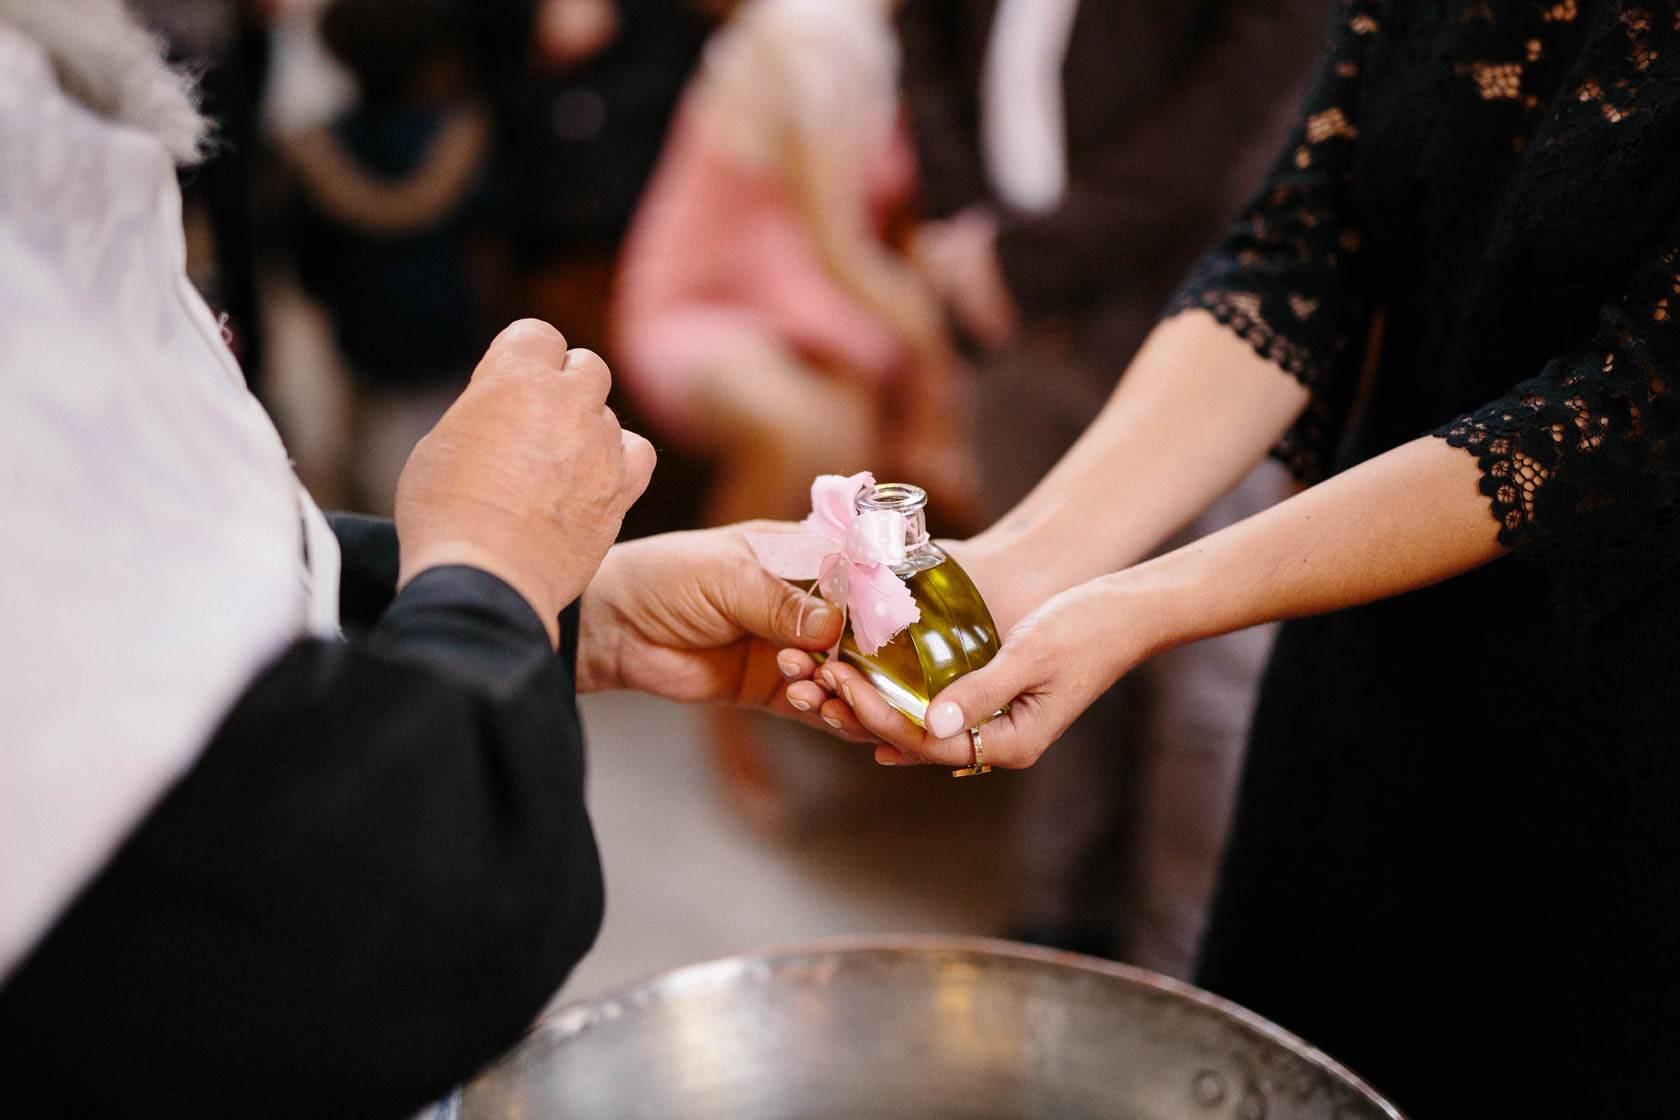 Grieschich-Orthodoxe Taufe in Wiesloch Freude Taufpatin